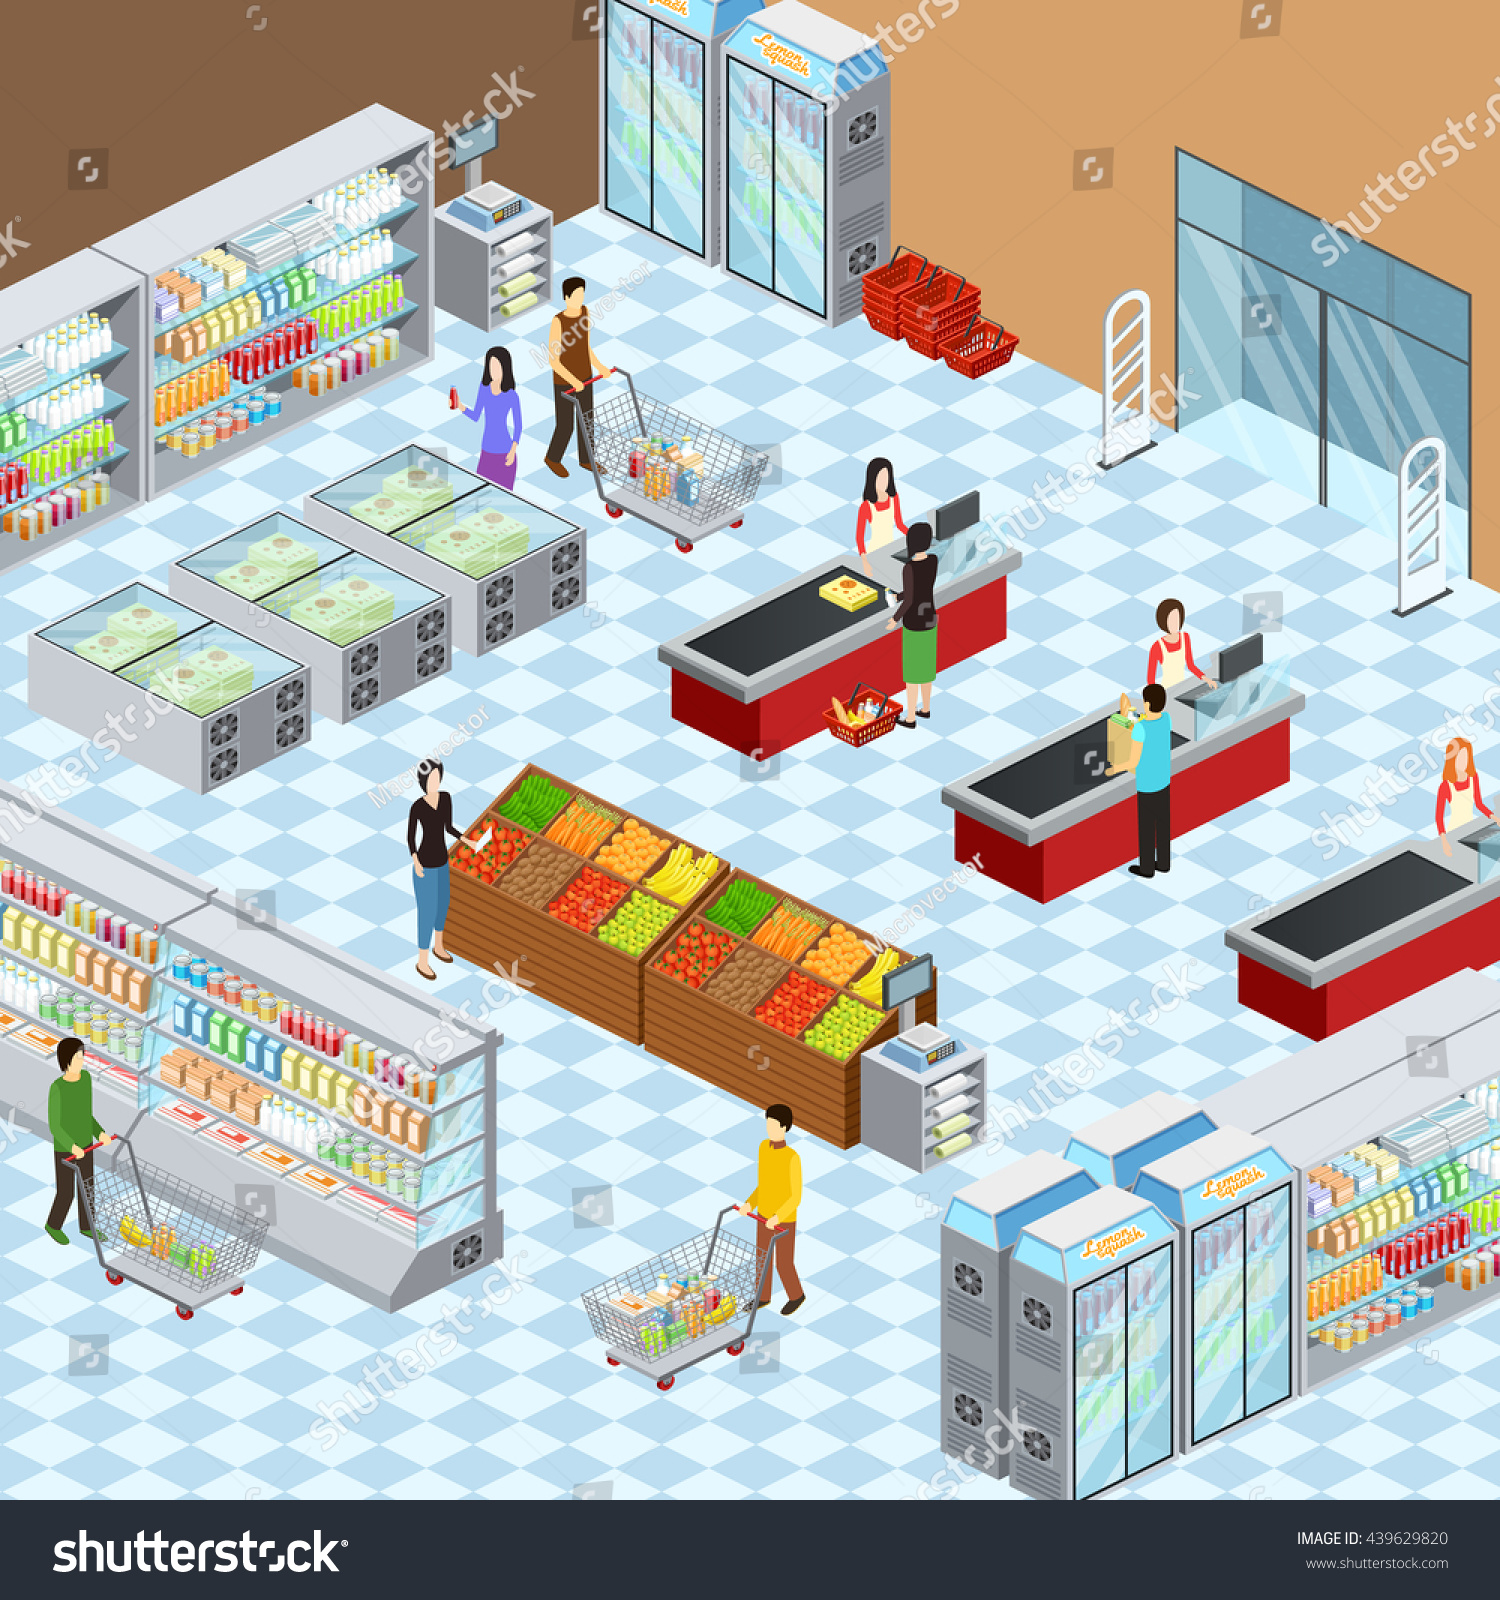 Supermarket Grocery Store Interior Design Isometric